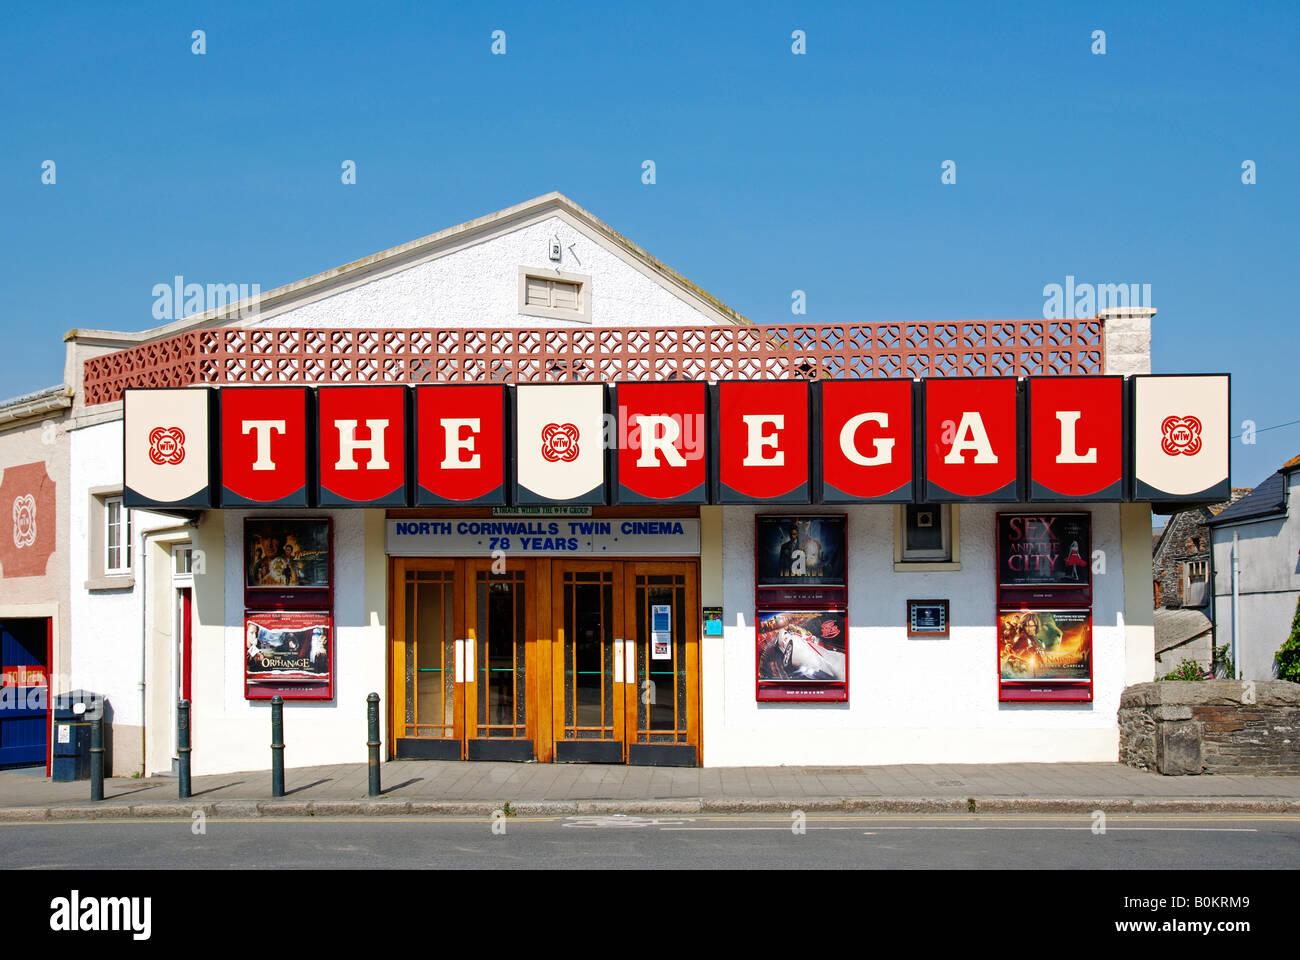 L'ancien cinéma Regal à wadebridge à Cornwall, Angleterre Photo Stock